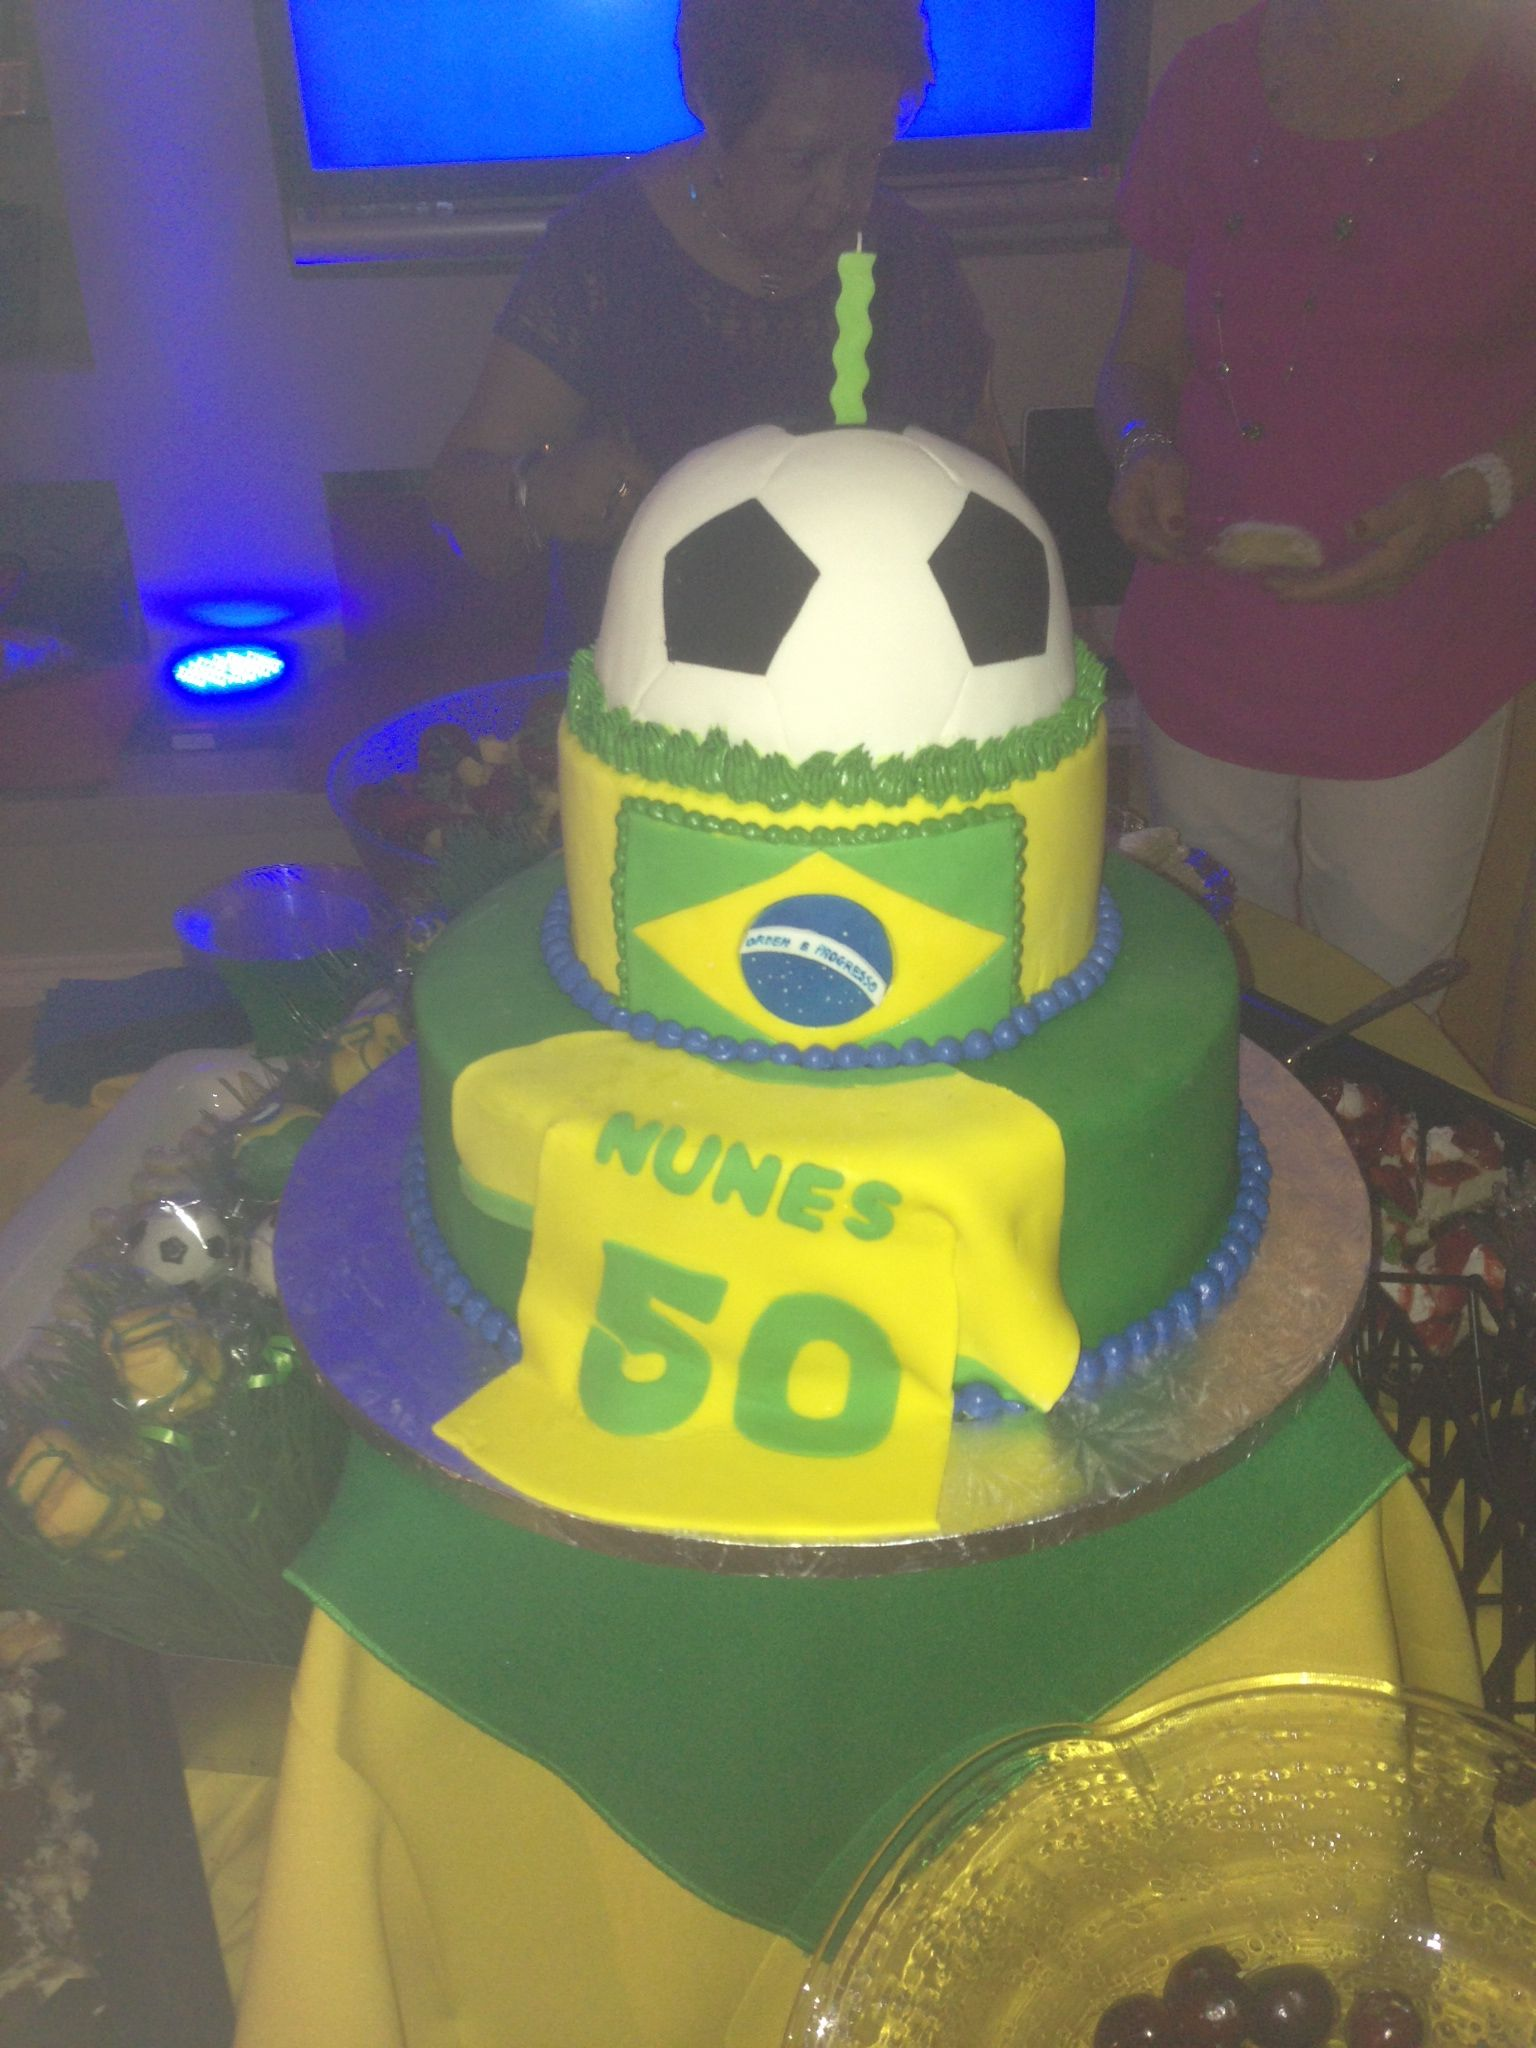 Awesome Brazilian Soccer Cake Futebol Brasilero Soccer Cake Soccer Funny Birthday Cards Online Inifodamsfinfo